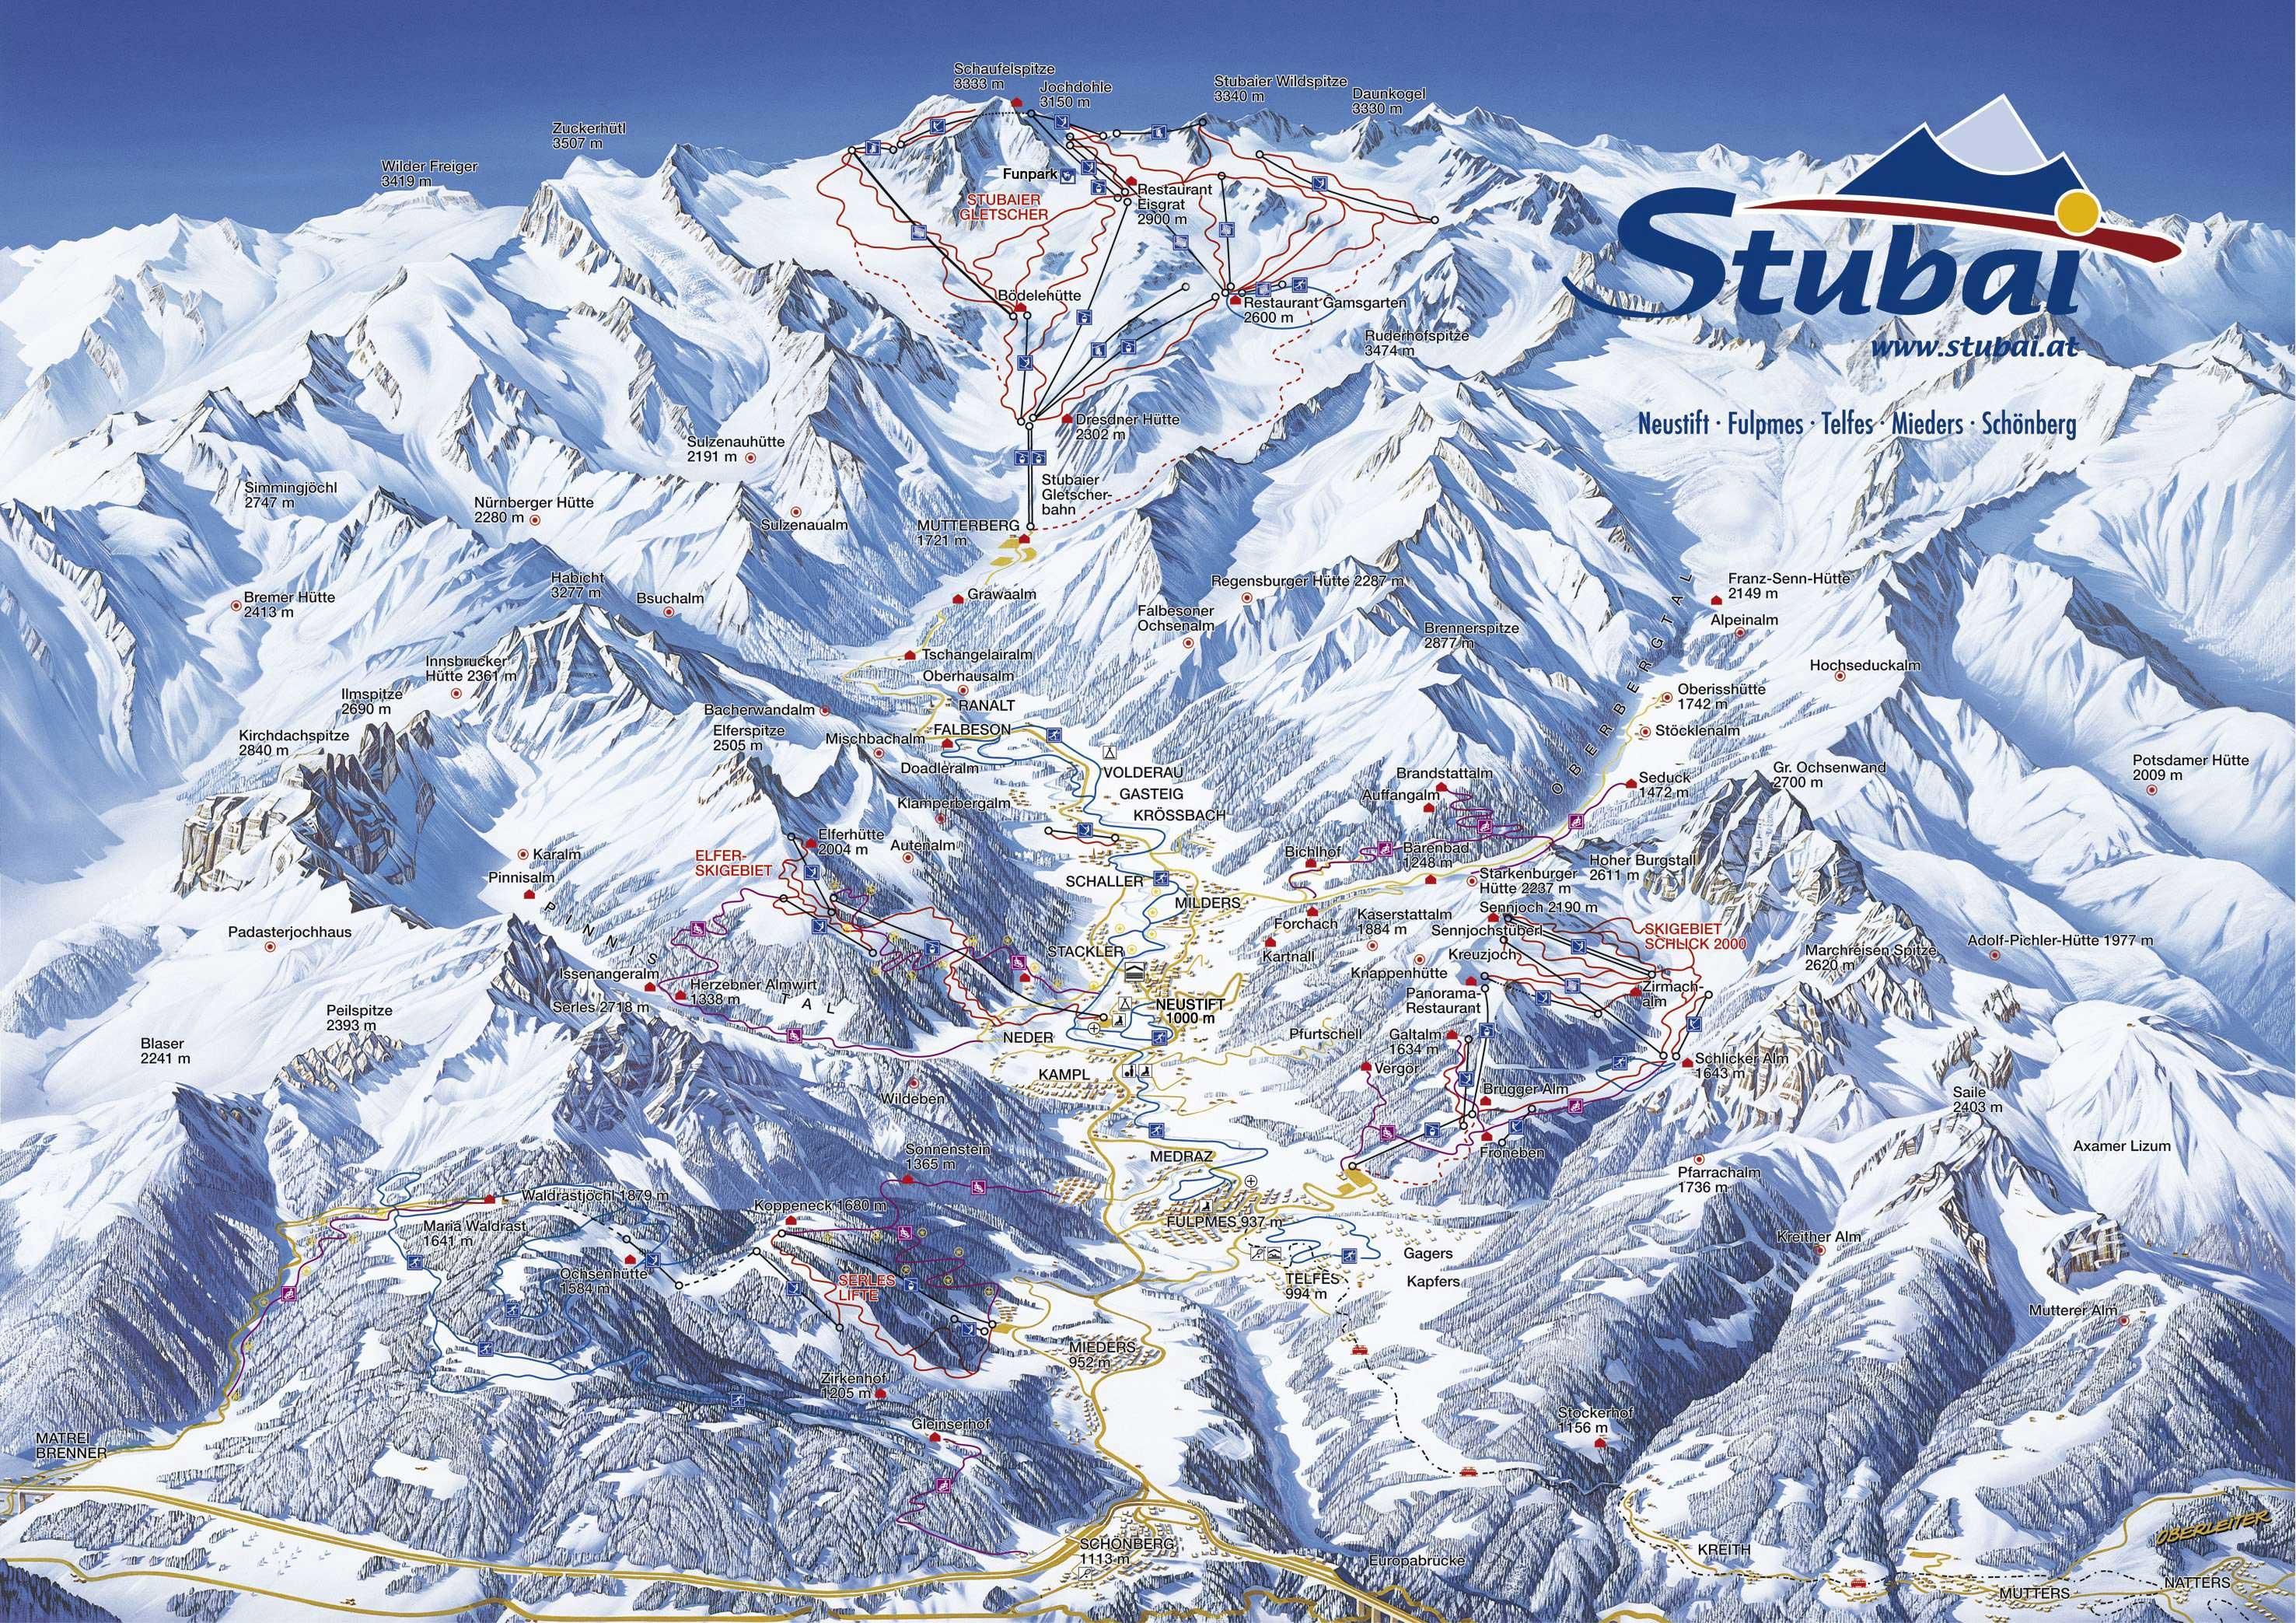 https://skitours.com.ua/sites/default/files/images/resorts/Austria/Stubai/StubaiMap.jpg